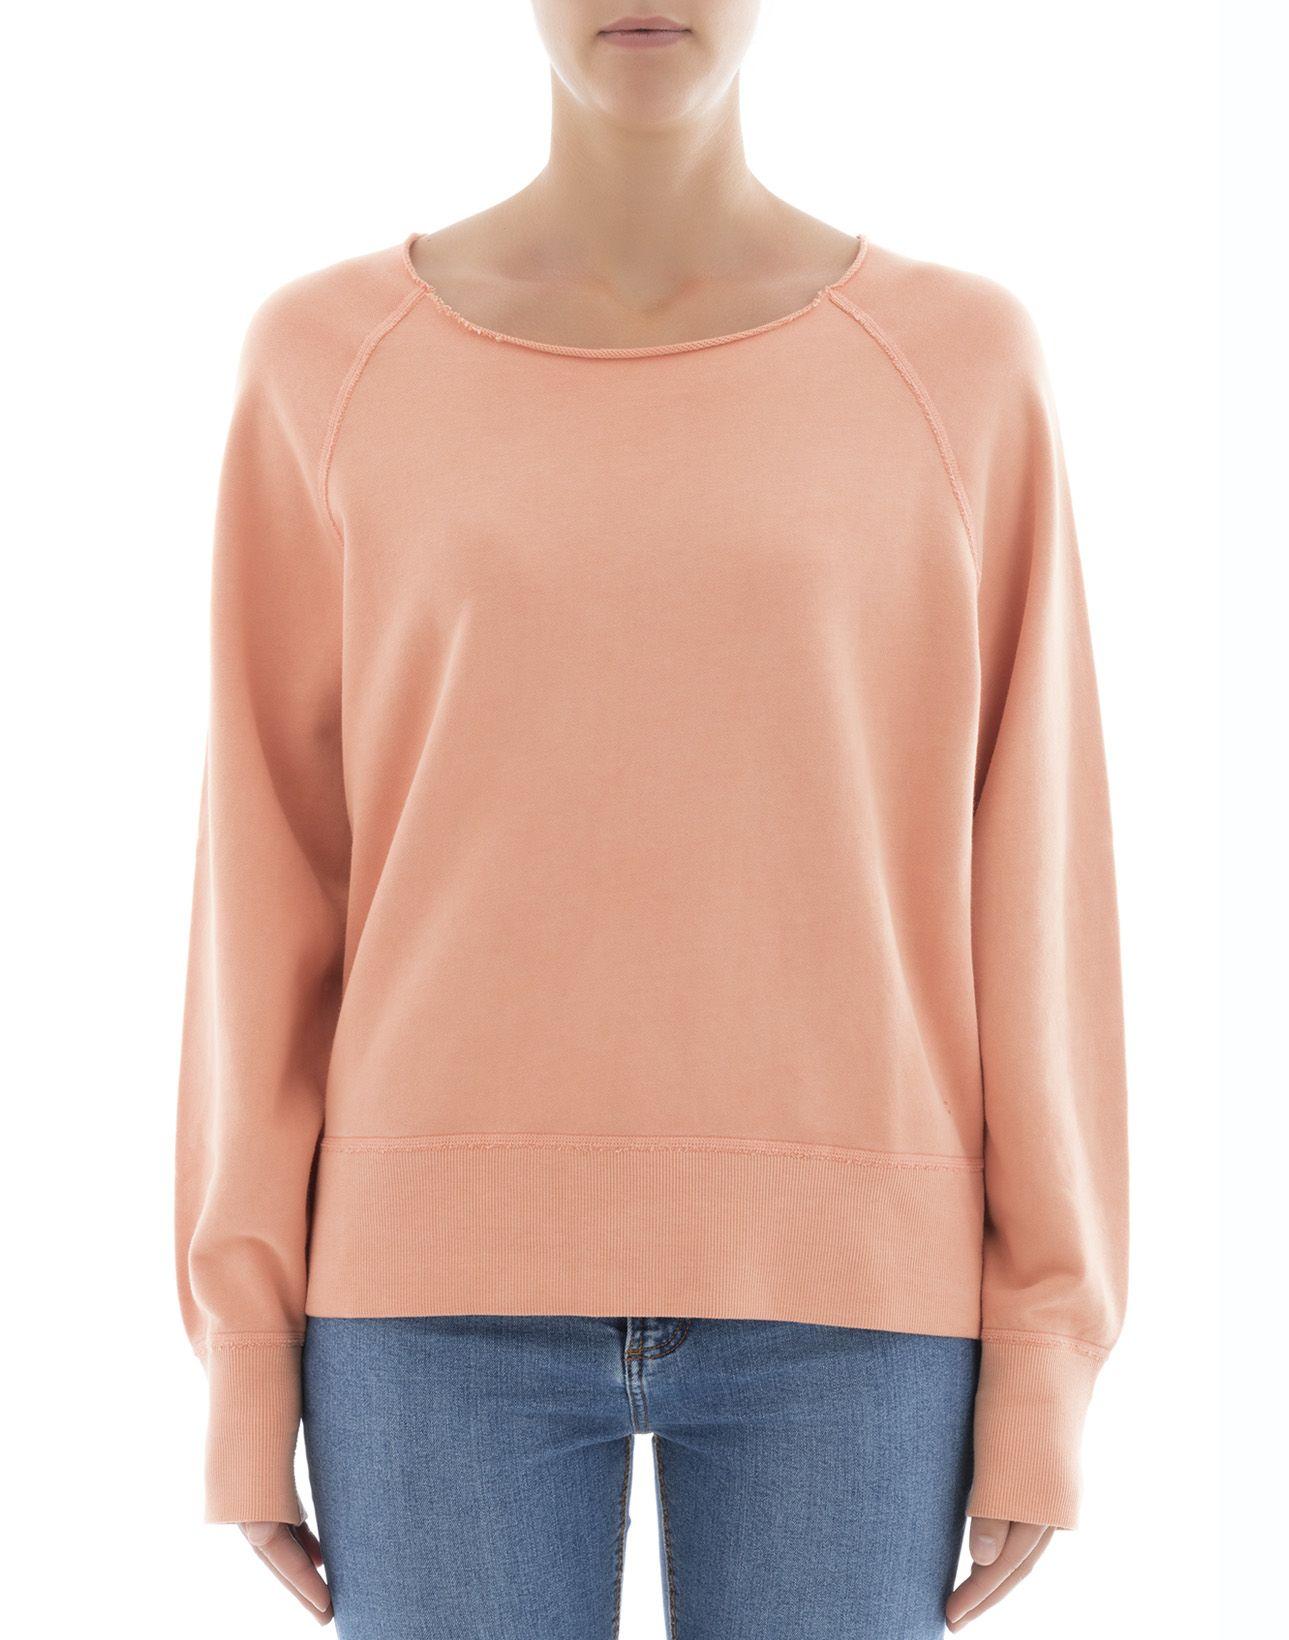 Rag & Bone - Orange Cotton Sweater - Orange, Women's Sweaters ...